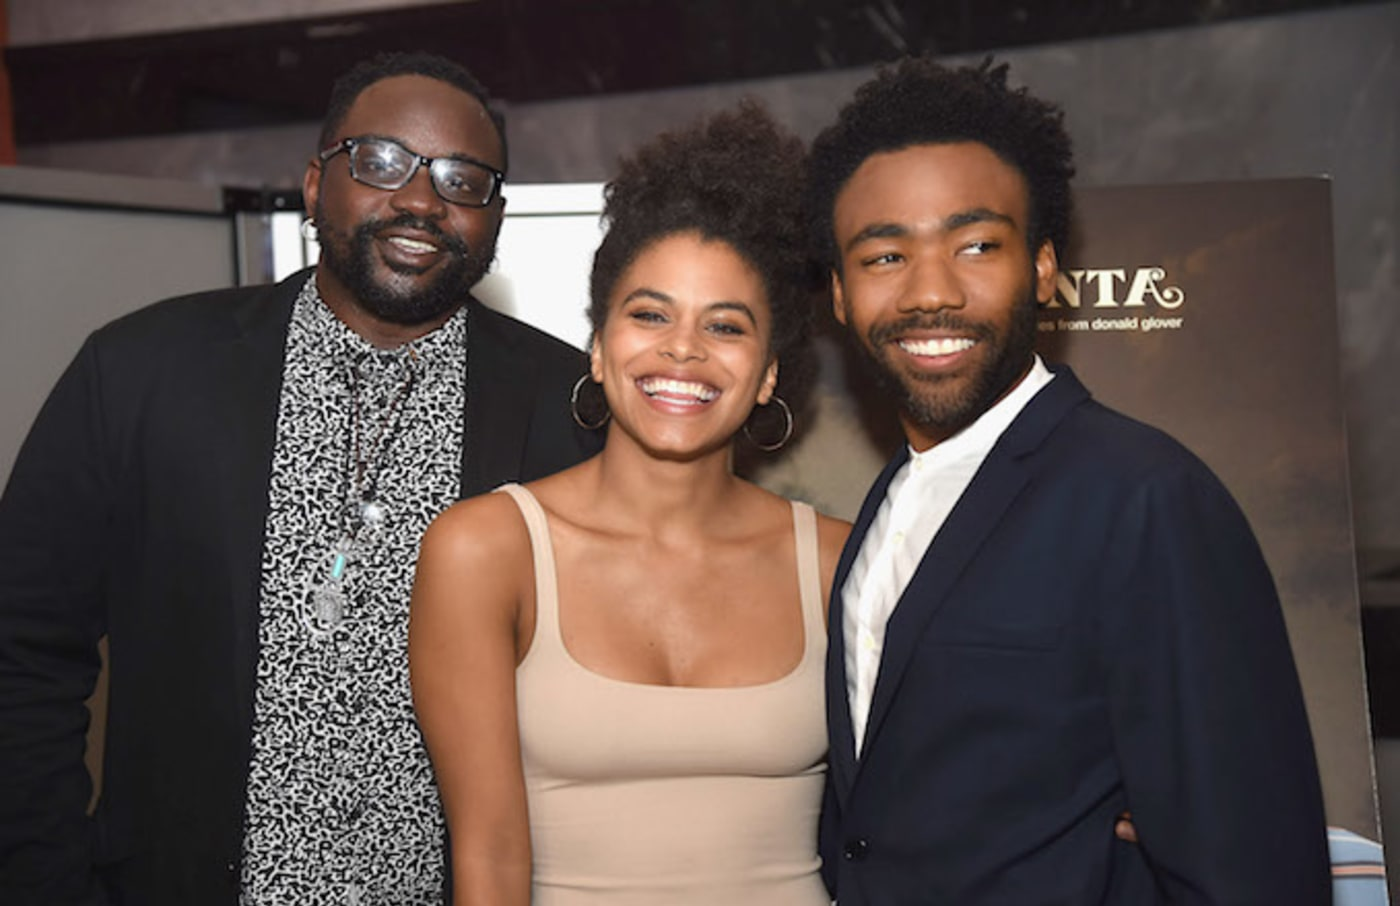 'Atlanta' stars Brian Tyree Henry, Zazie Beetz, and Donald Glover